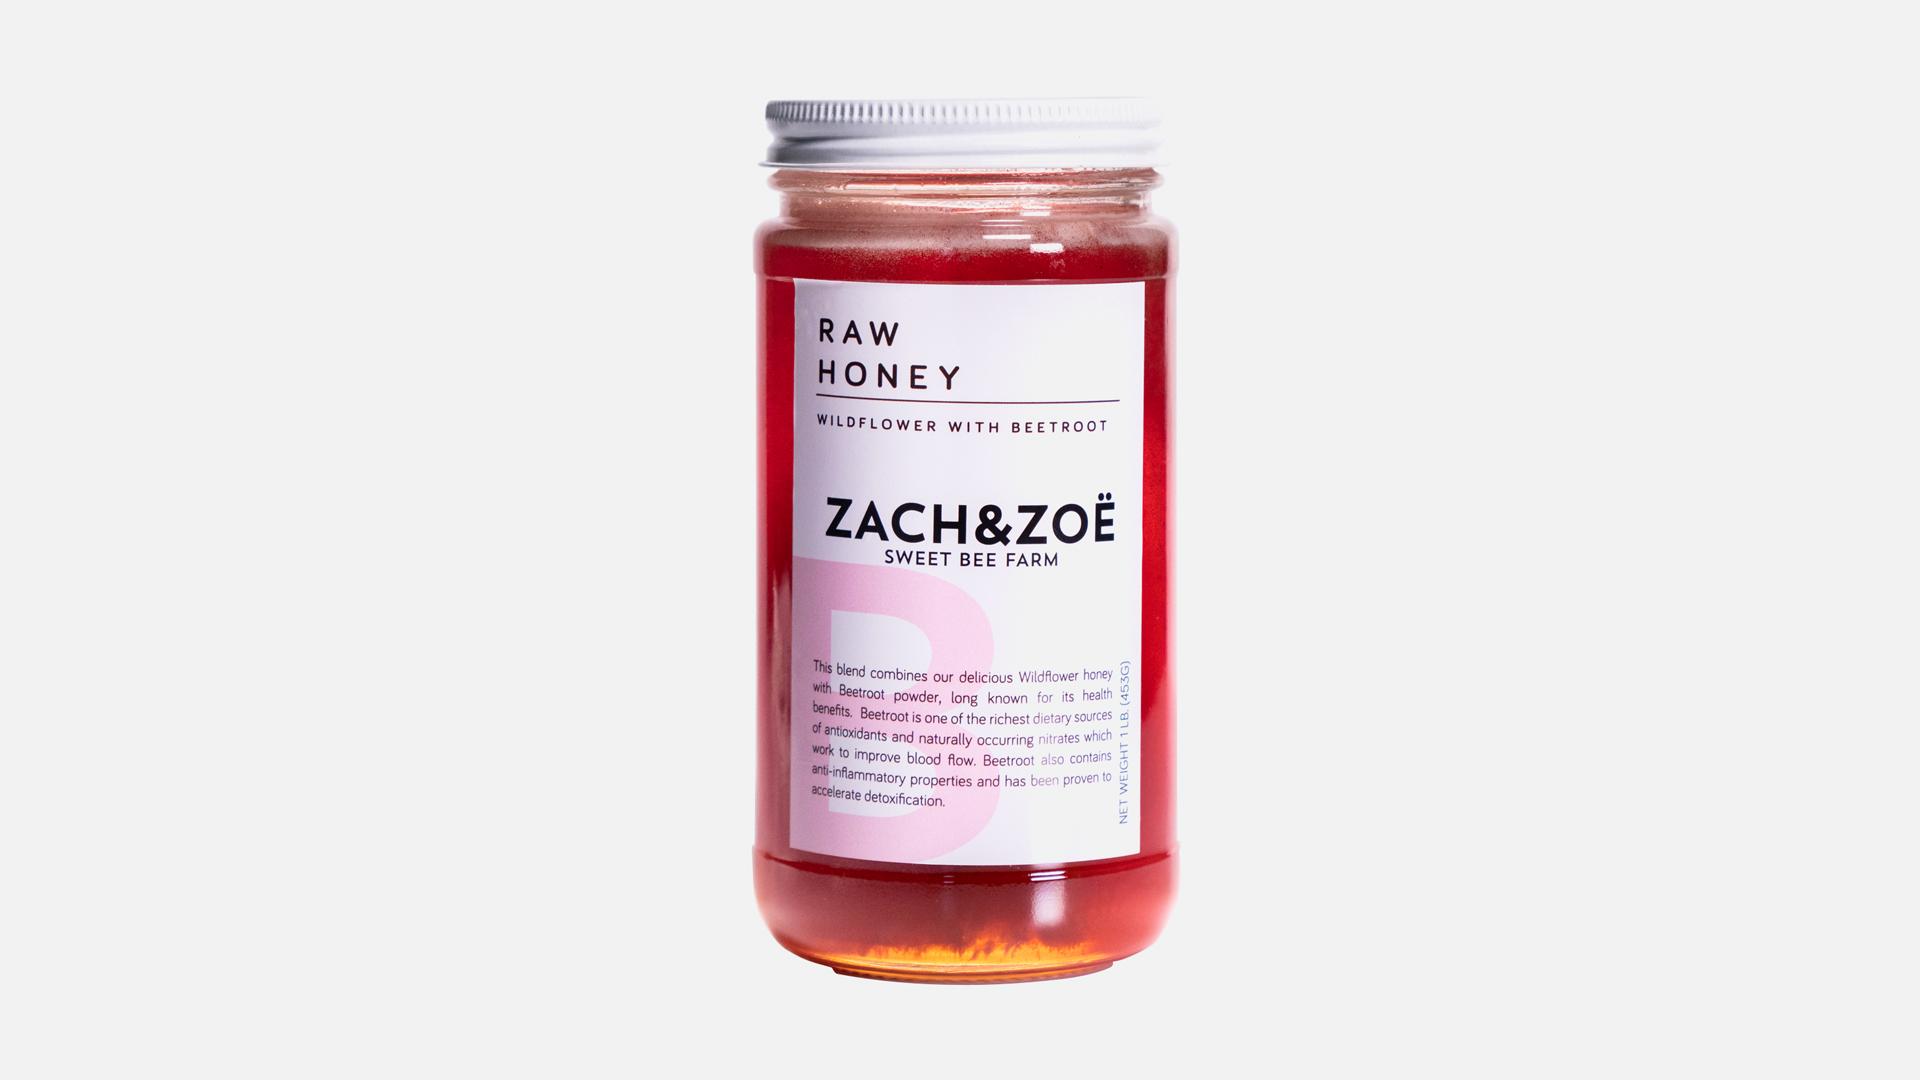 Zach and Zoe Beetroot Honey